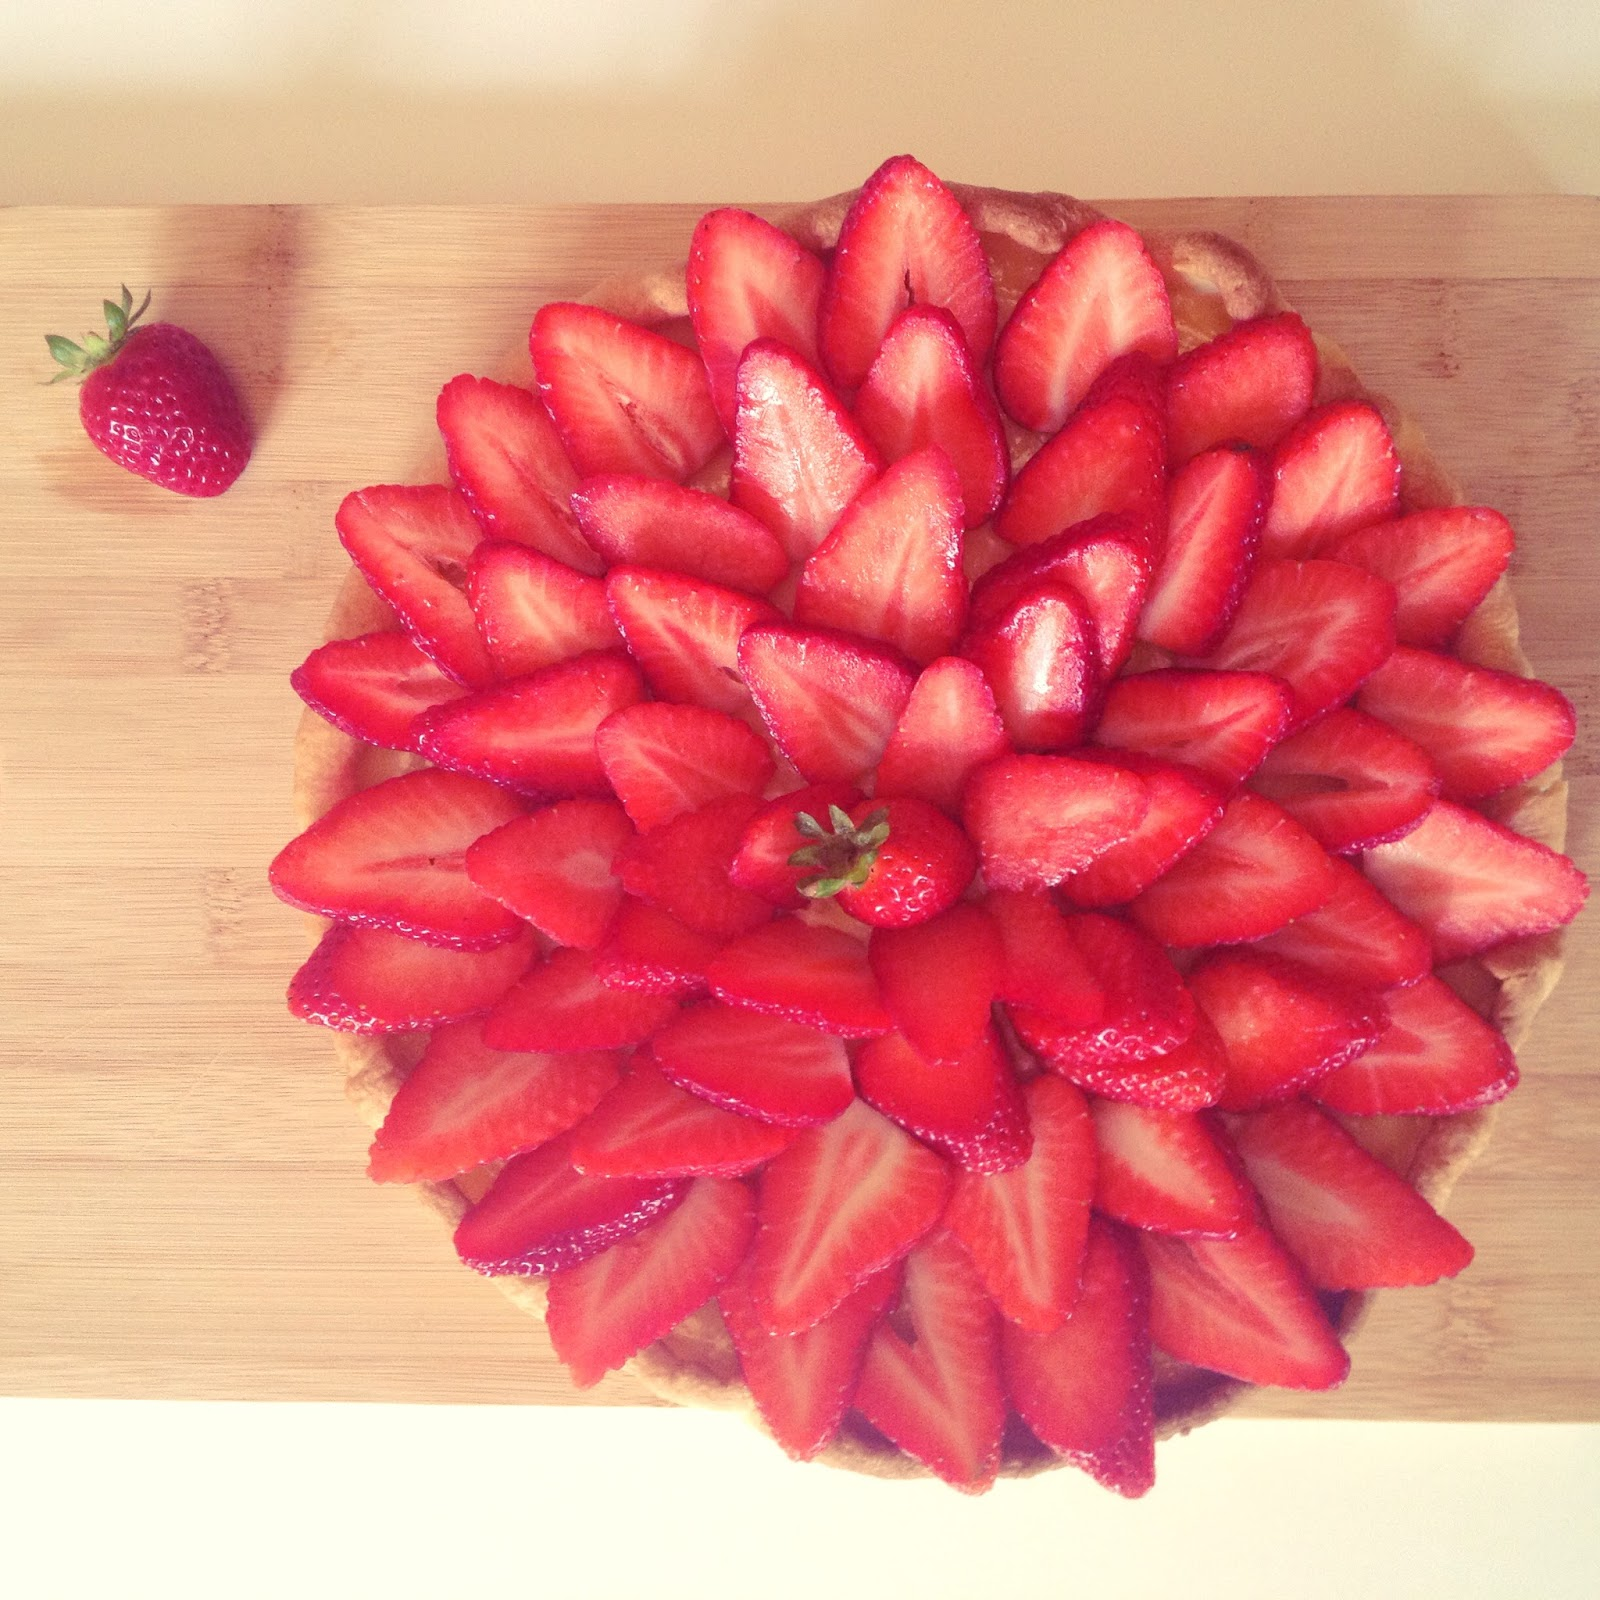 Doudou et mots doux ram ne ta fraise - Ramene ta fraise ...